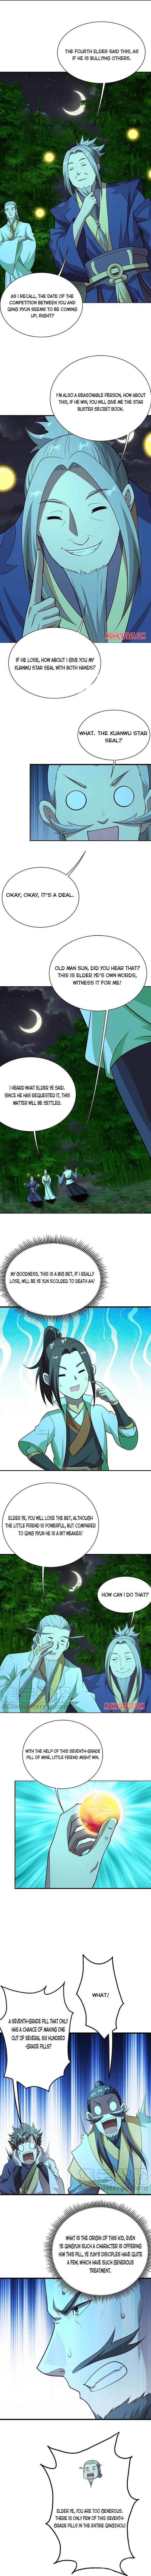 Matchless Emperor Chapter 220 page 4 - Mangakakalots.com